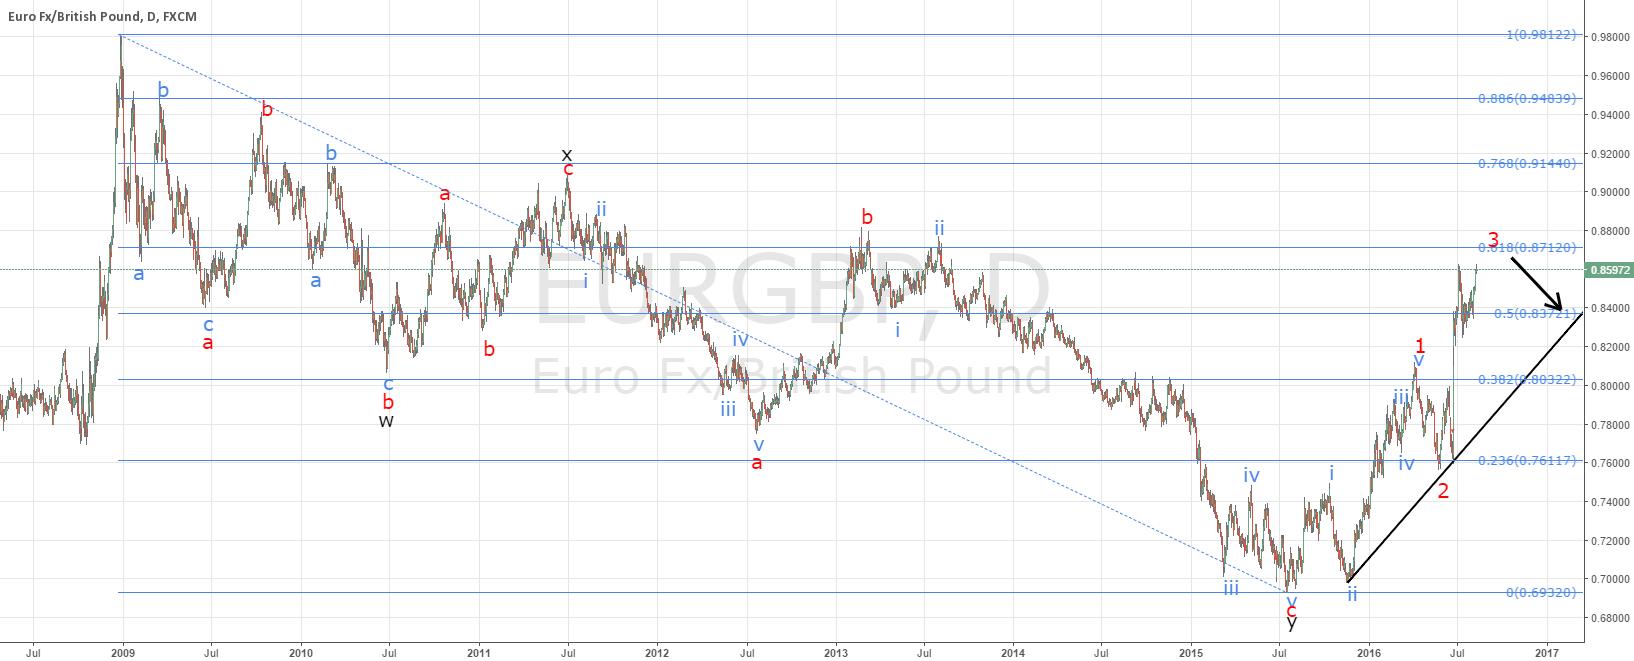 EURGBP little higher then down